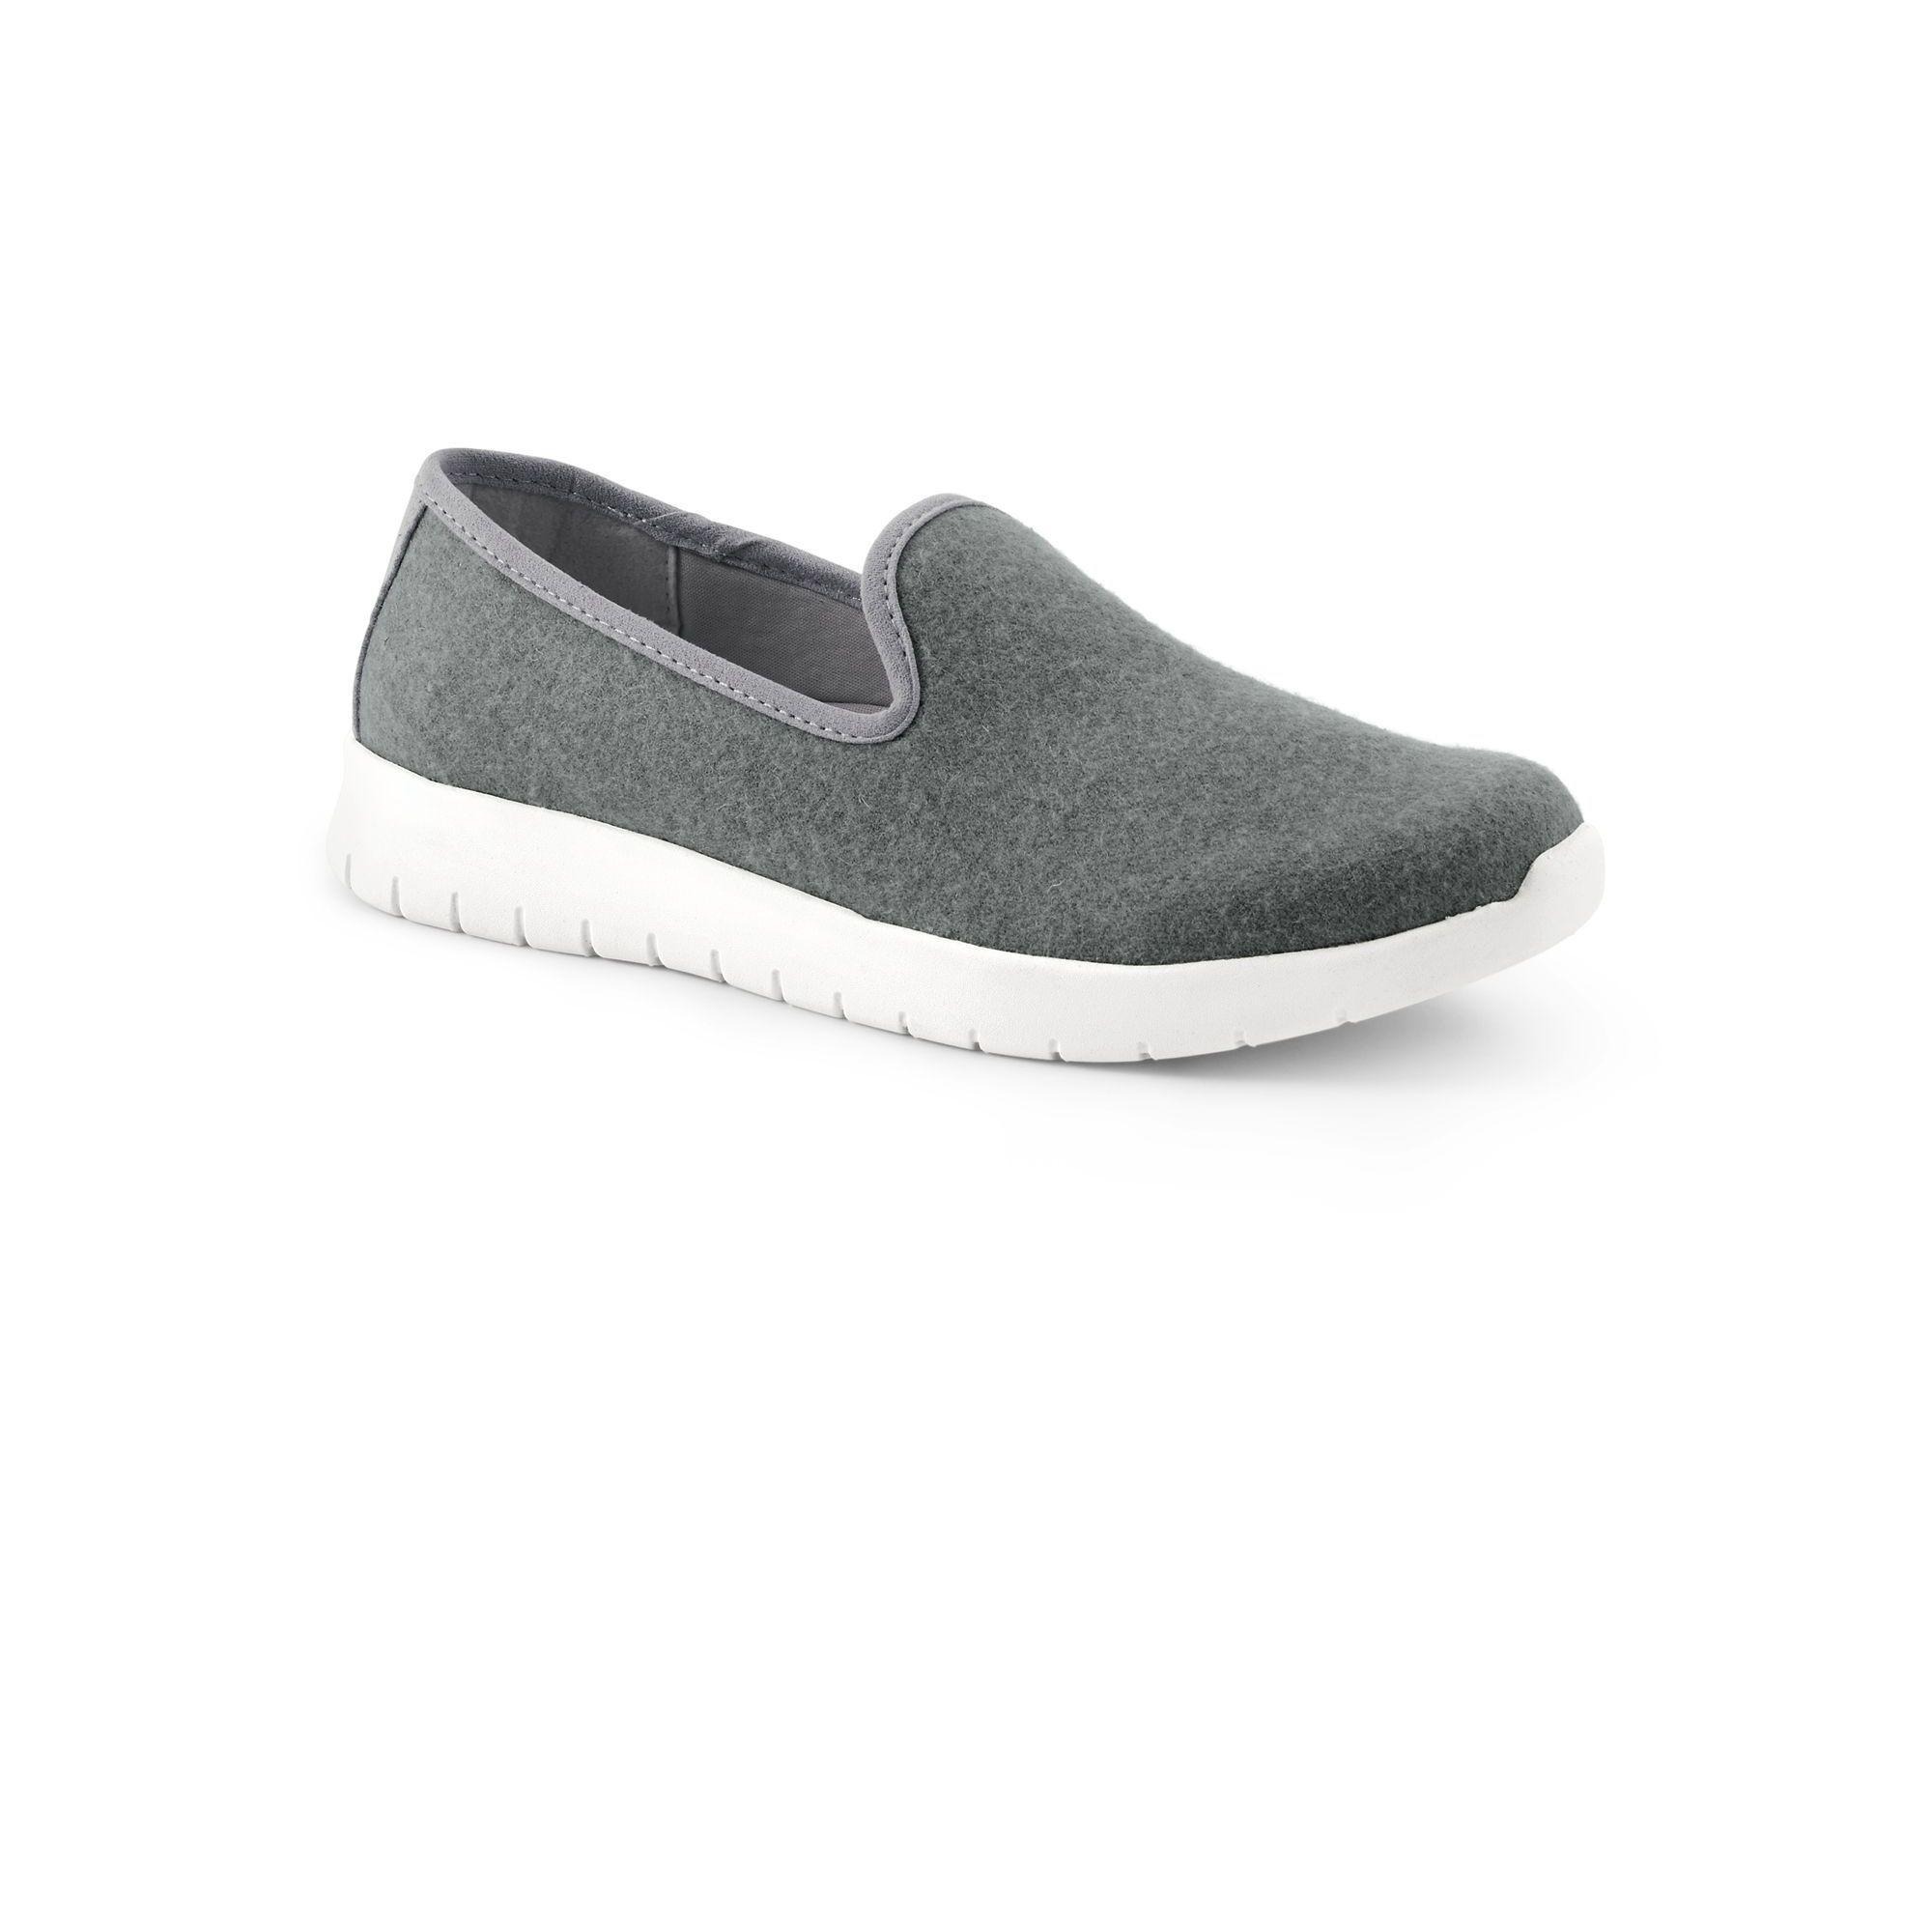 new styles 8ffa5 eb6a2 lands-end-Grey-Grey-Lightweight-Comfort-Wool-Slip-on-Shoes.jpeg